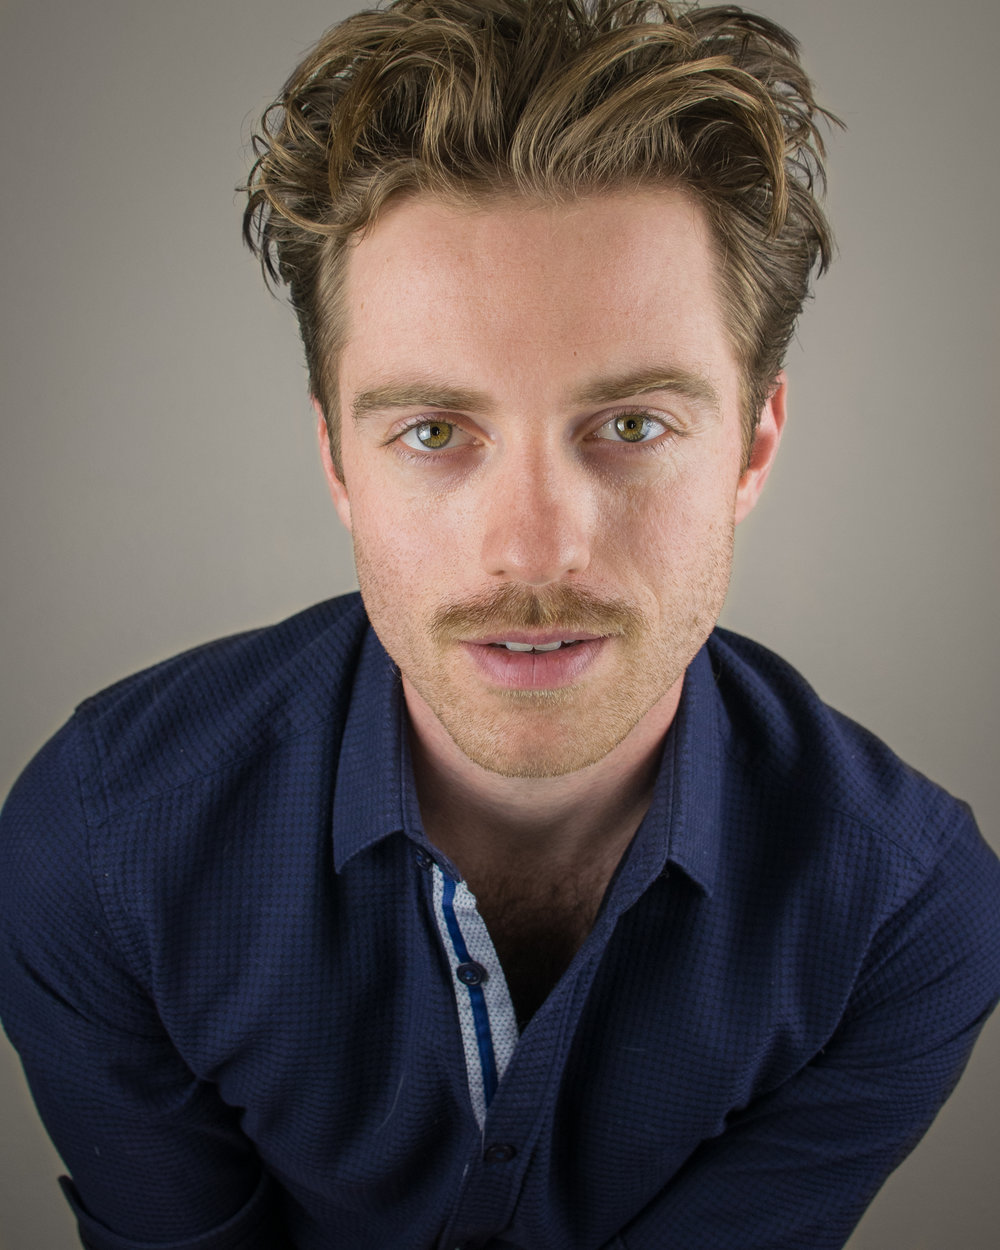 Alex Nee mustache headshot-3.jpg